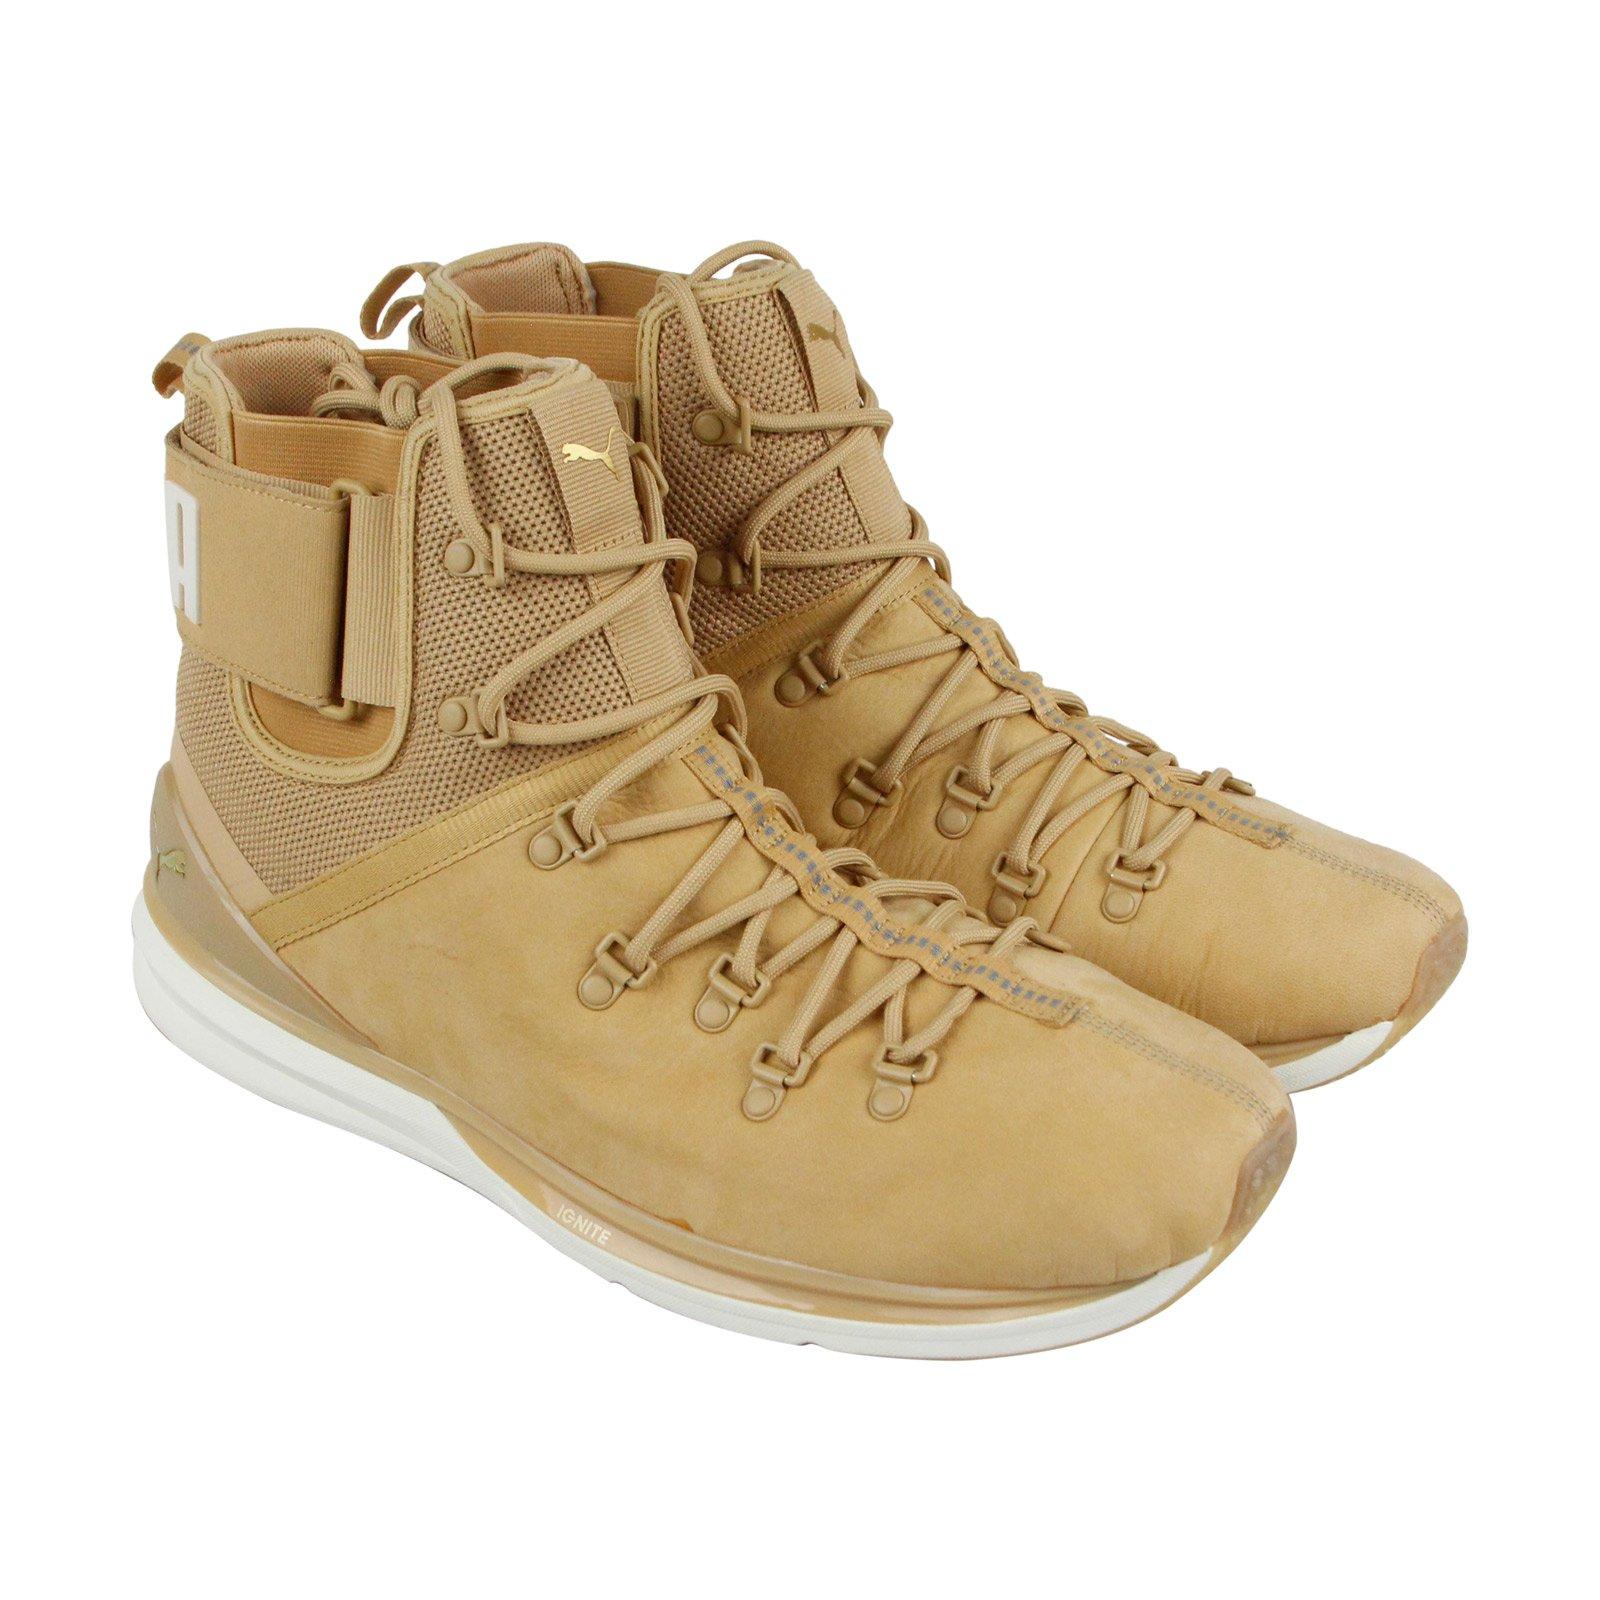 PUMA Men's Ignite Limitless Boot Leather Sneaker, Taffy-Whisper White, 11 M US